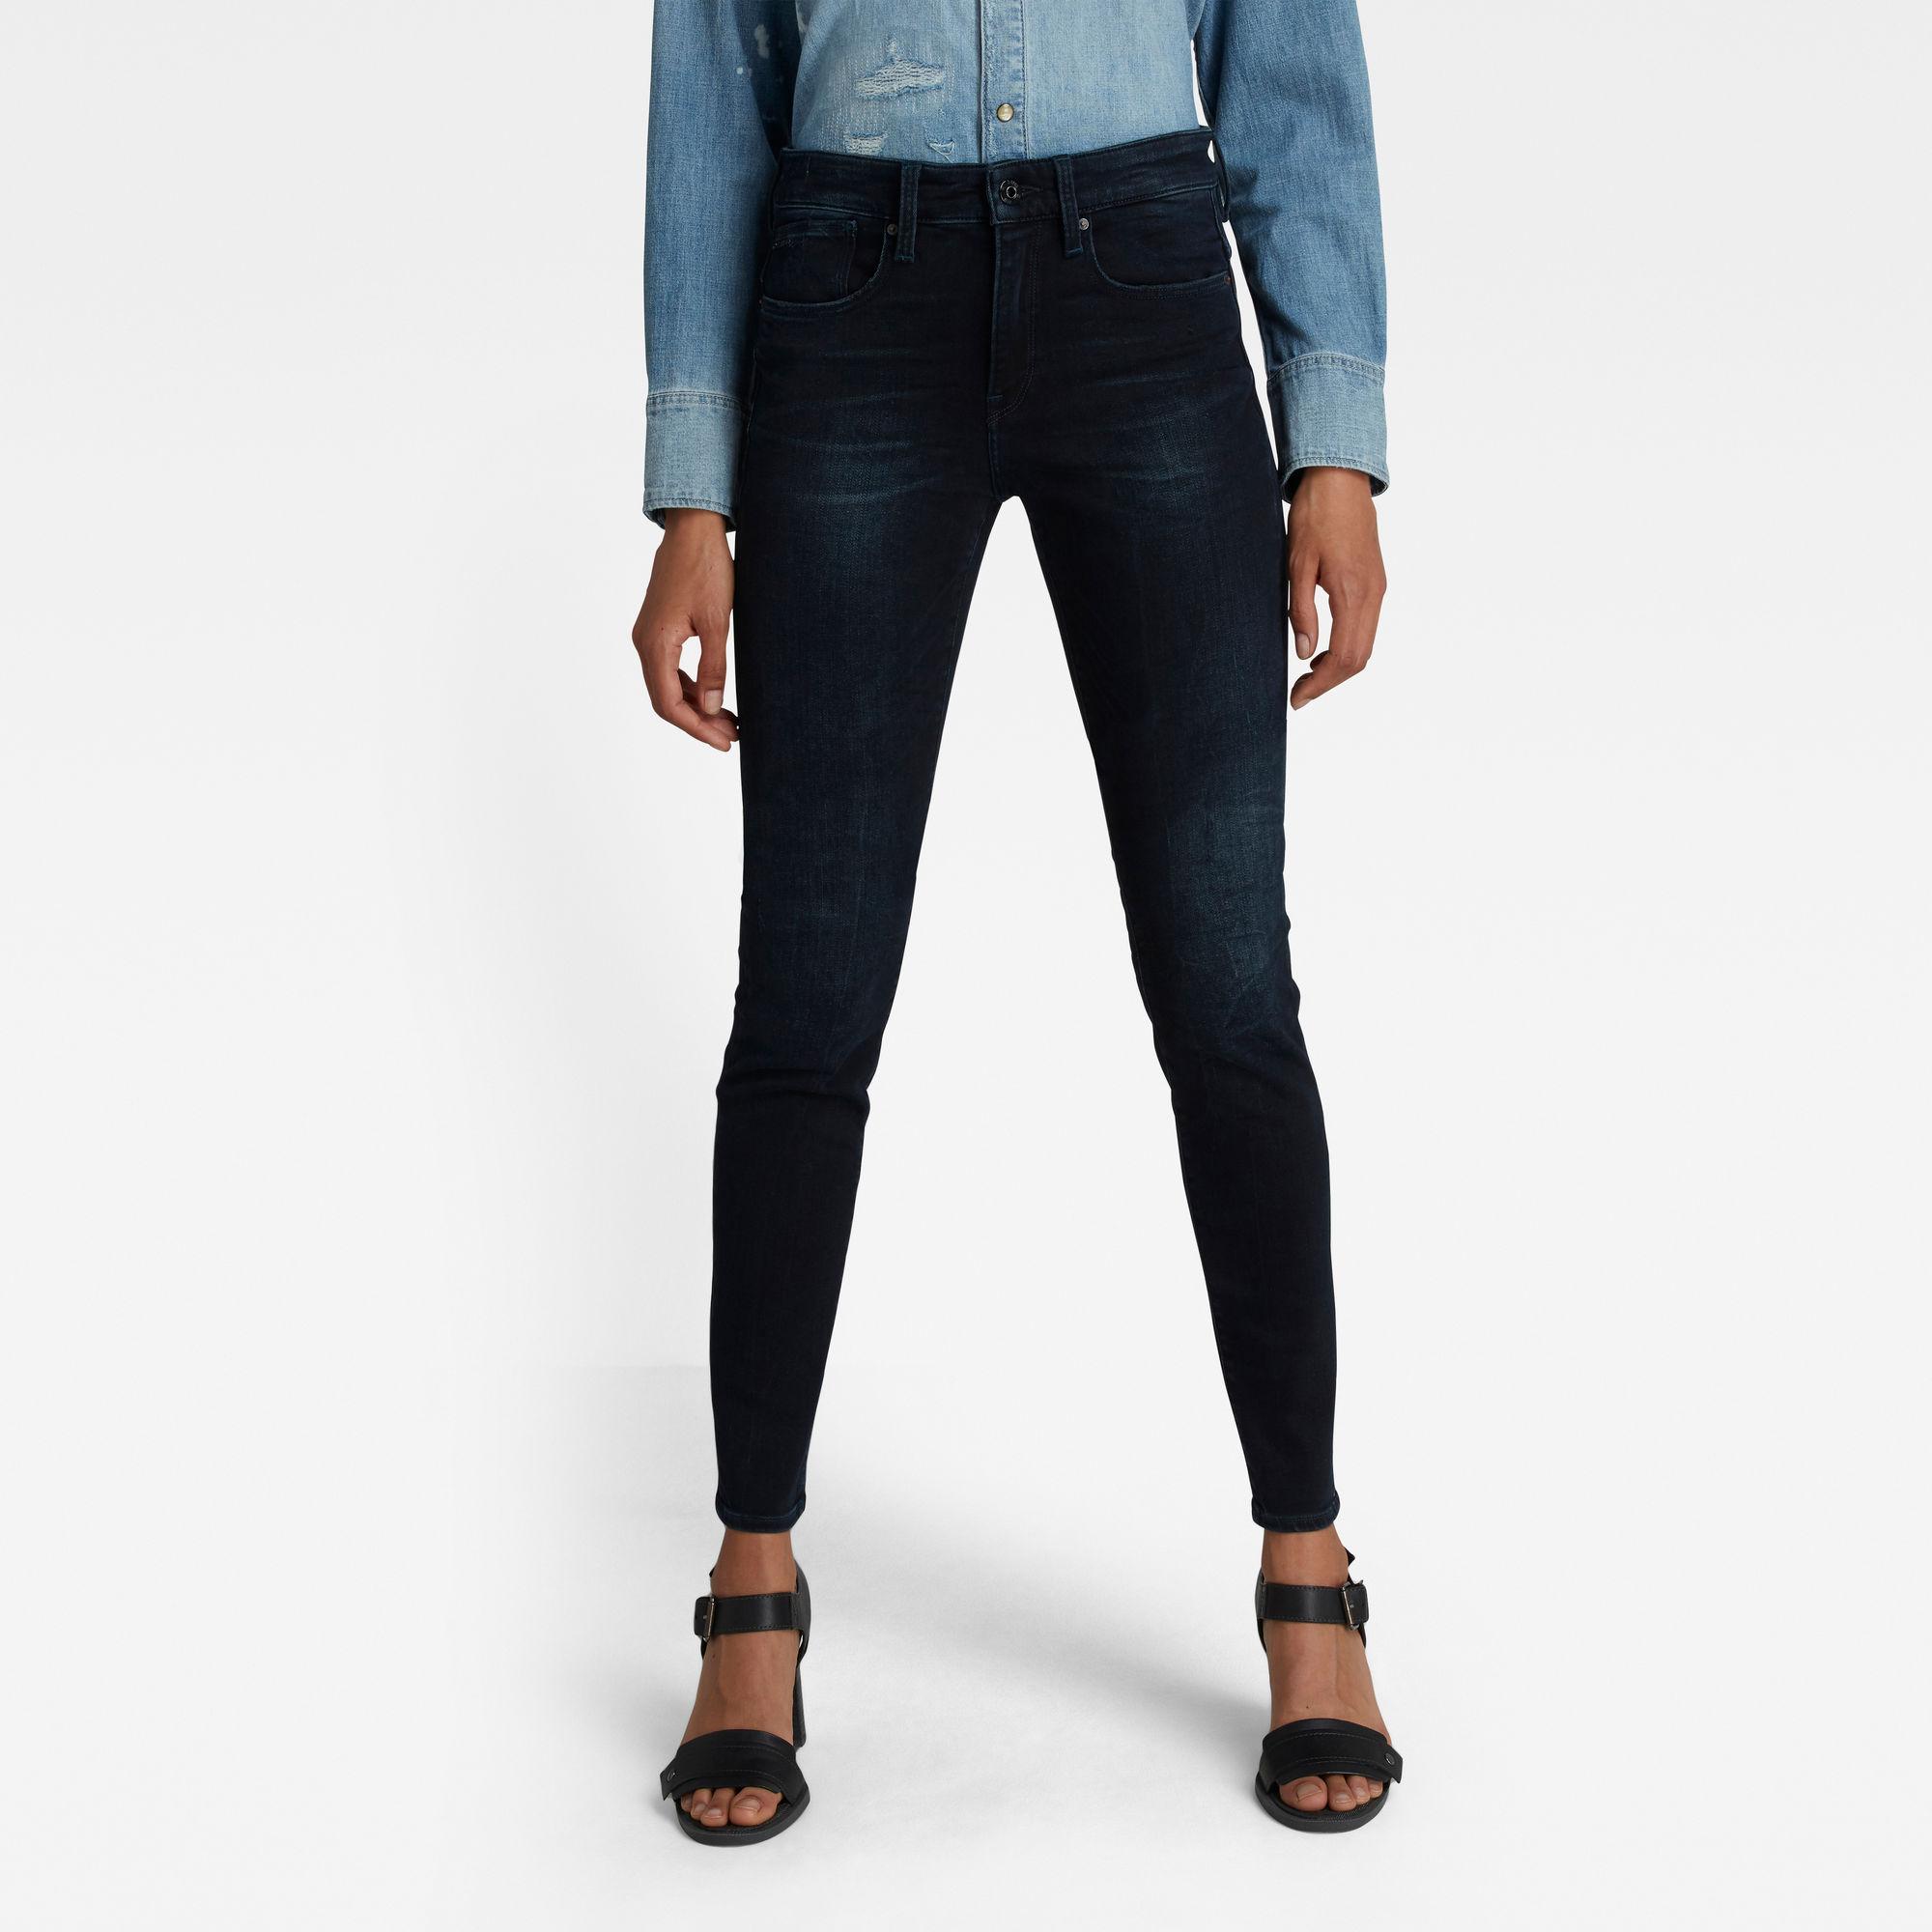 G-Star RAW Dames Lhana Skinny Jeans Donkerblauw